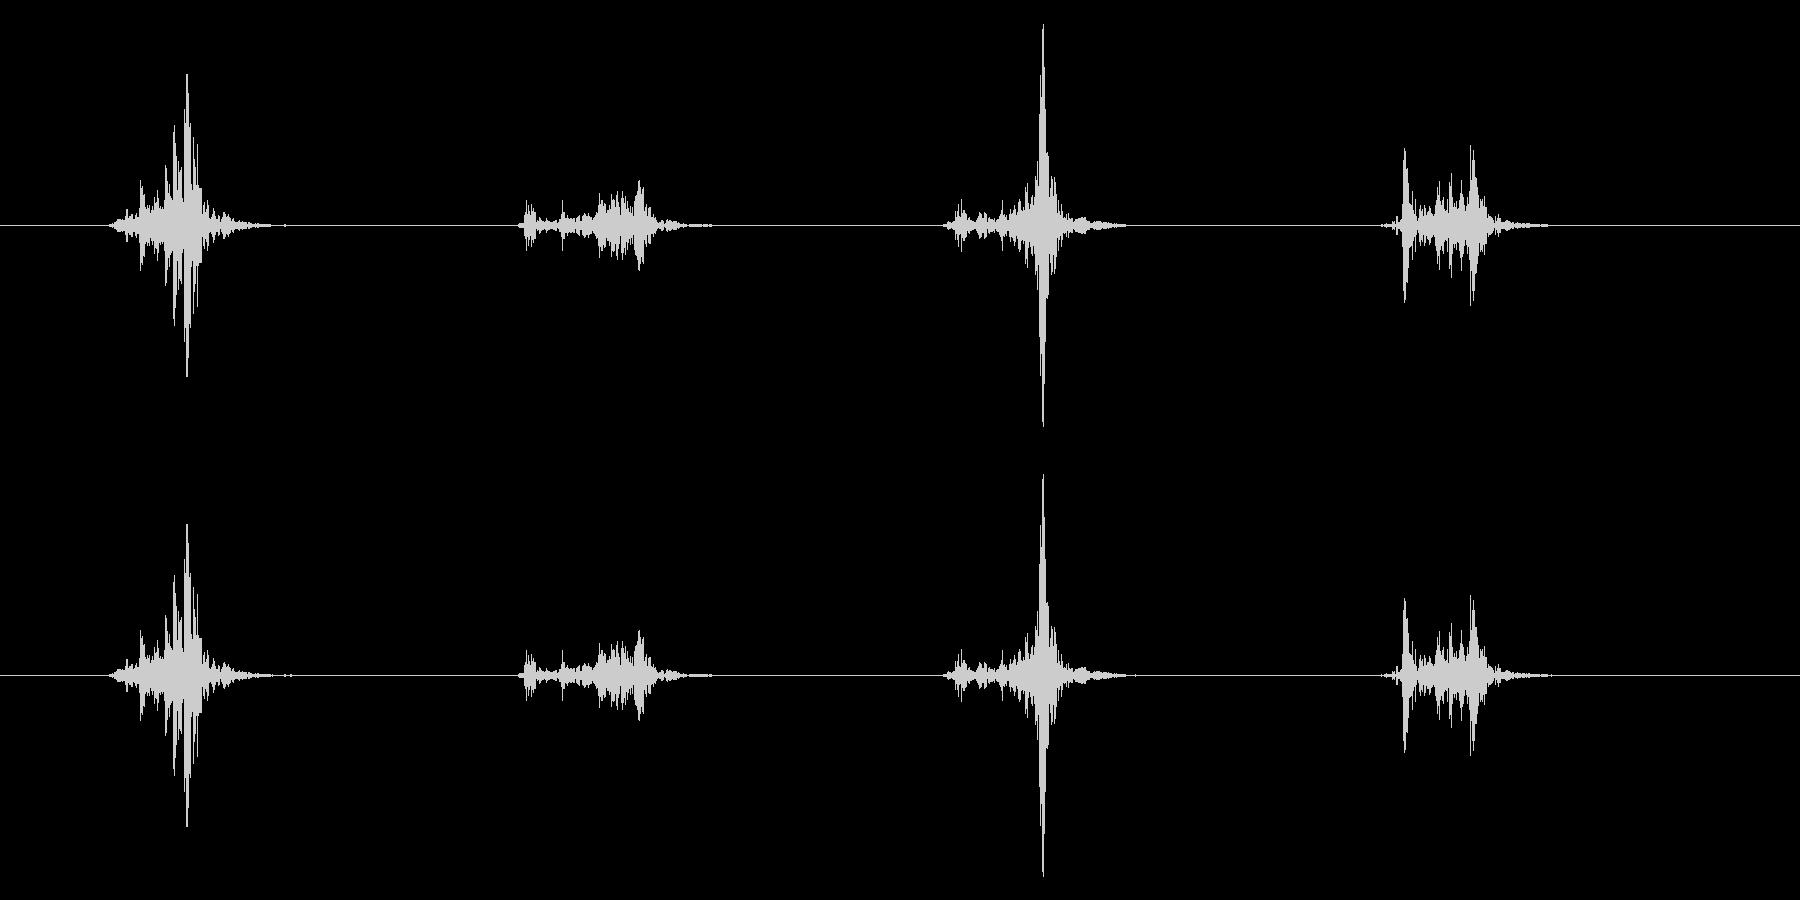 PC マウス04-22(スクロール 速)の未再生の波形